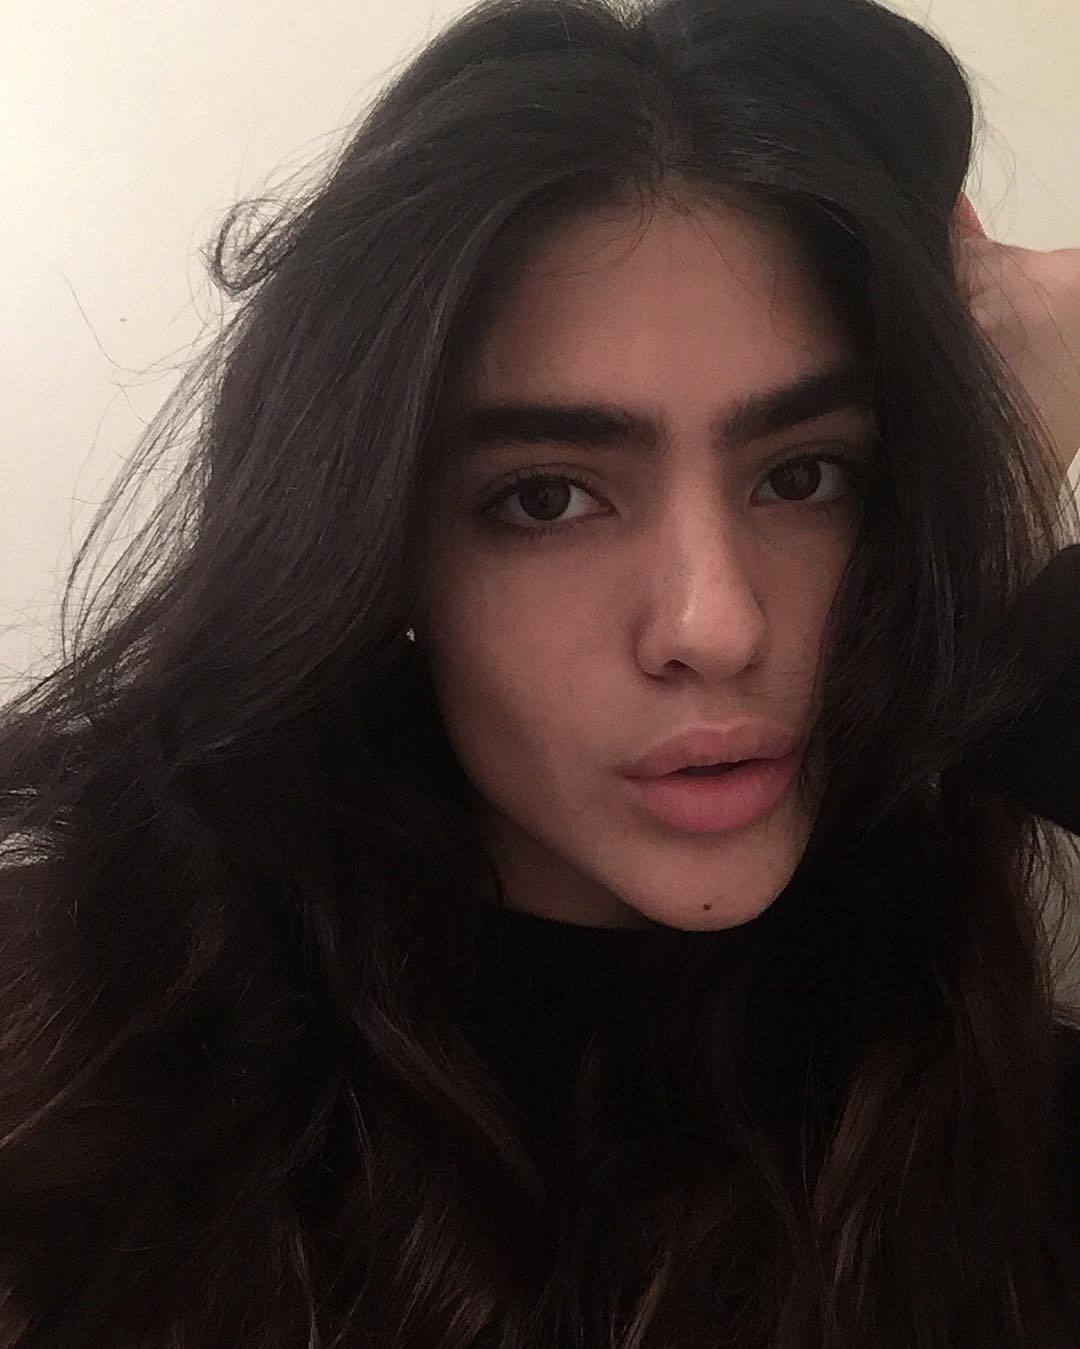 Fashion 2017 teenager - Bushy Browed Beauty Natalia Castellar Calvani Defies The